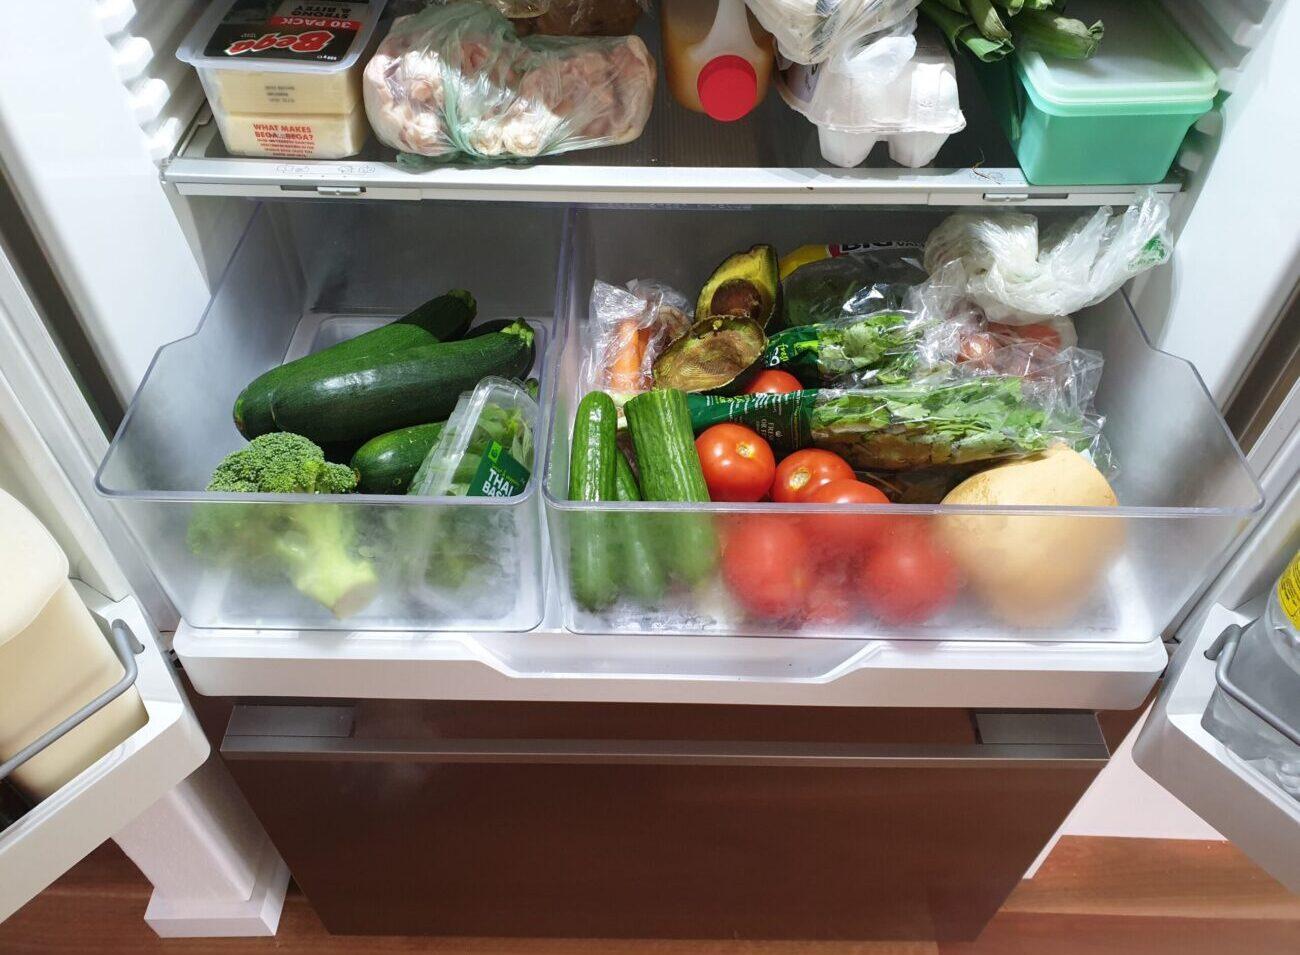 Cooking Tips To Help Get Through the Coronavirus Pandemic